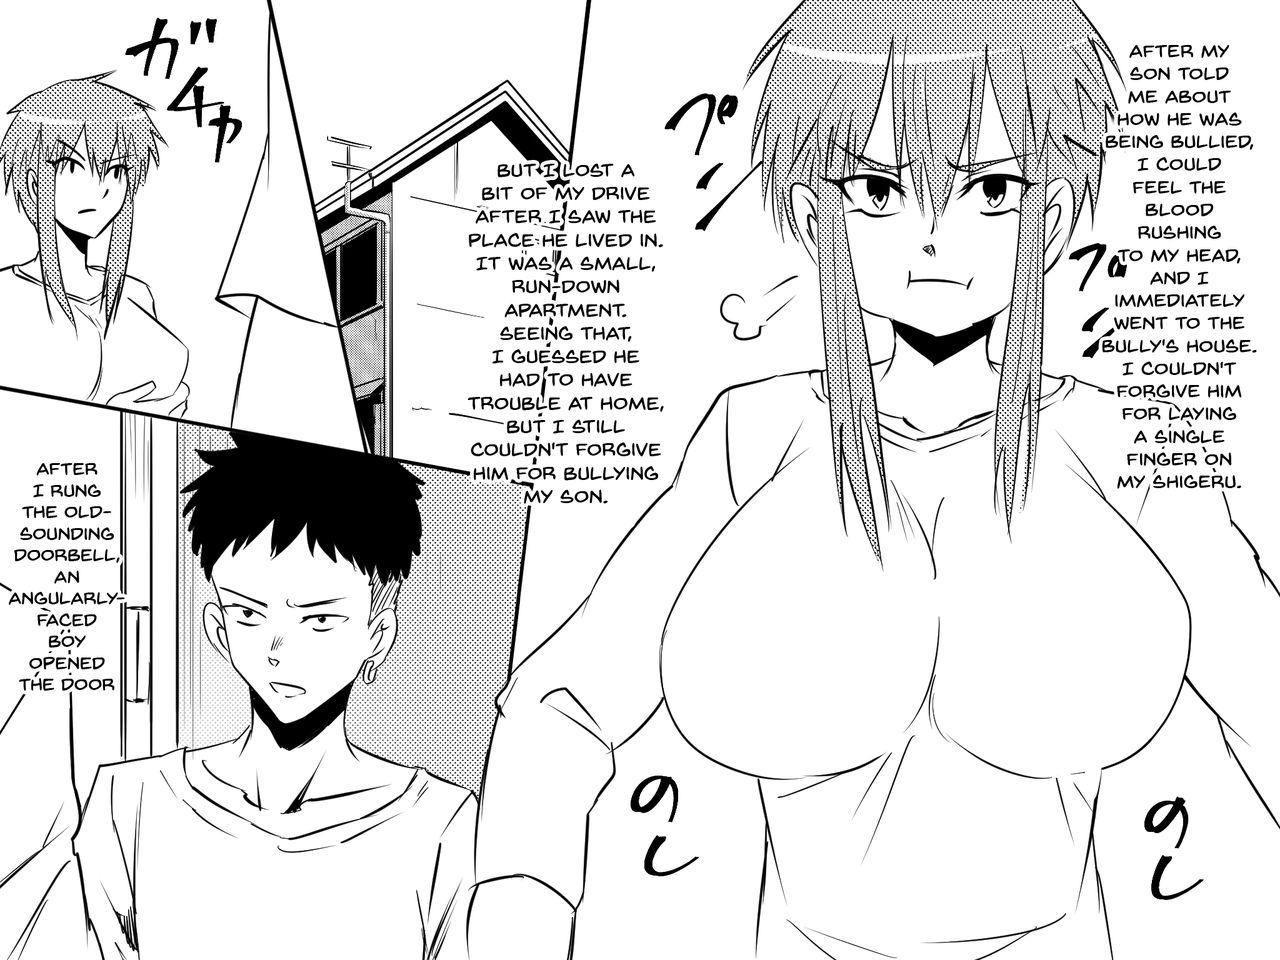 [Mikezoutei] Netorare Haha ~Kachiki de Kimottama no Okaa-san ga Boku o Ijimeru Aitsu no Onna ni Naru Hanashi~   Mom NTR ~A Story Of How My Gutsy Mom Ended Up Becoming My Bully's Plaything~ [English] {Doujins.com} 34